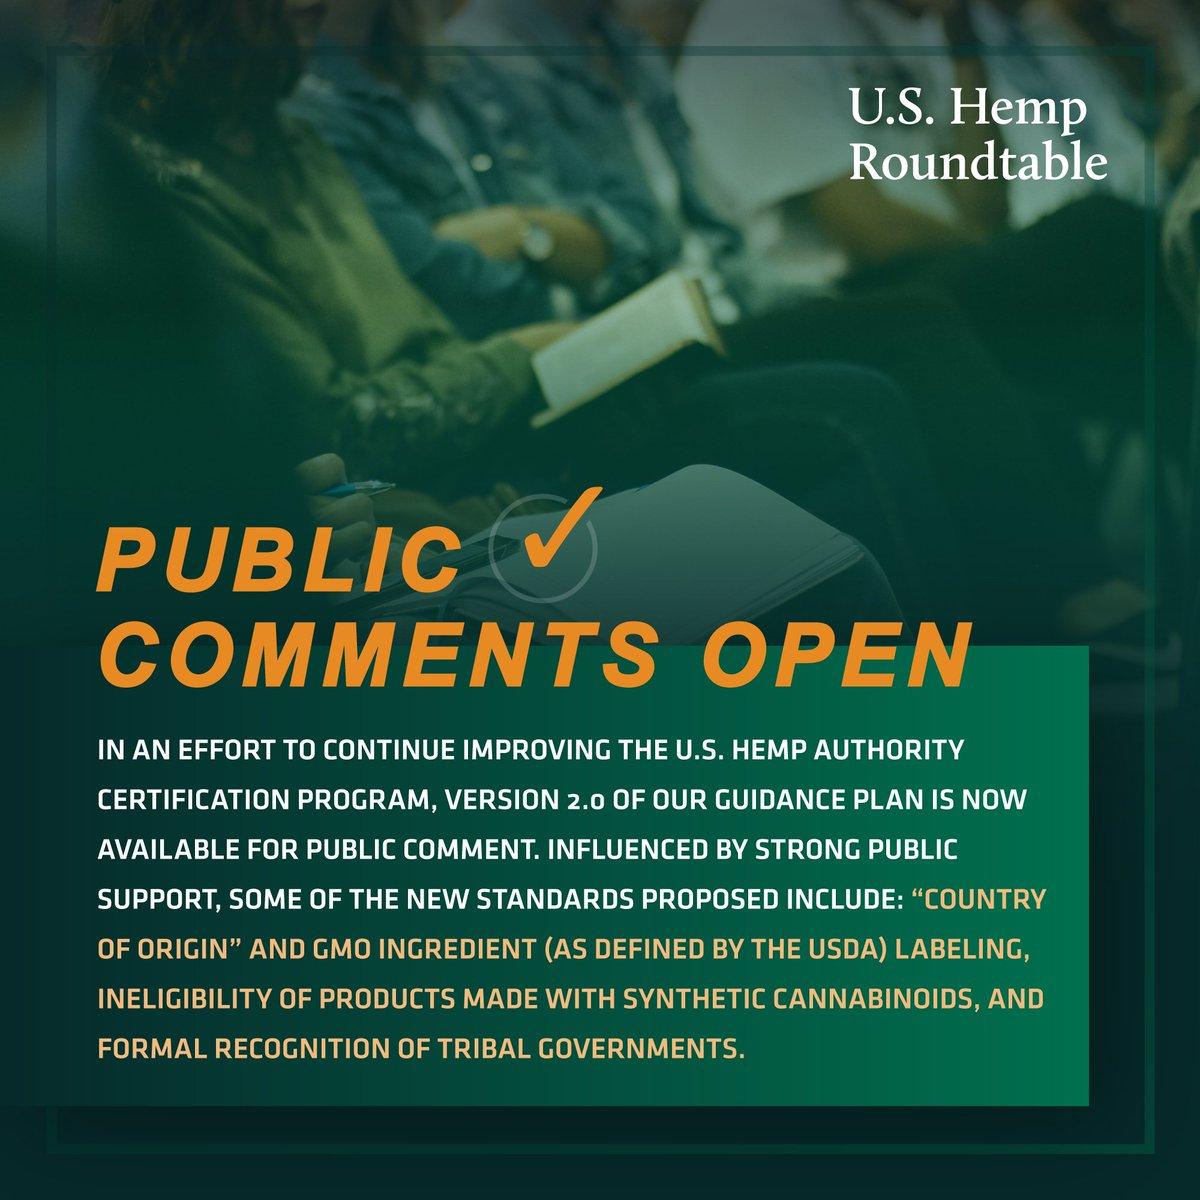 US Hemp Roundtable (@HempRoundtable) | Twitter